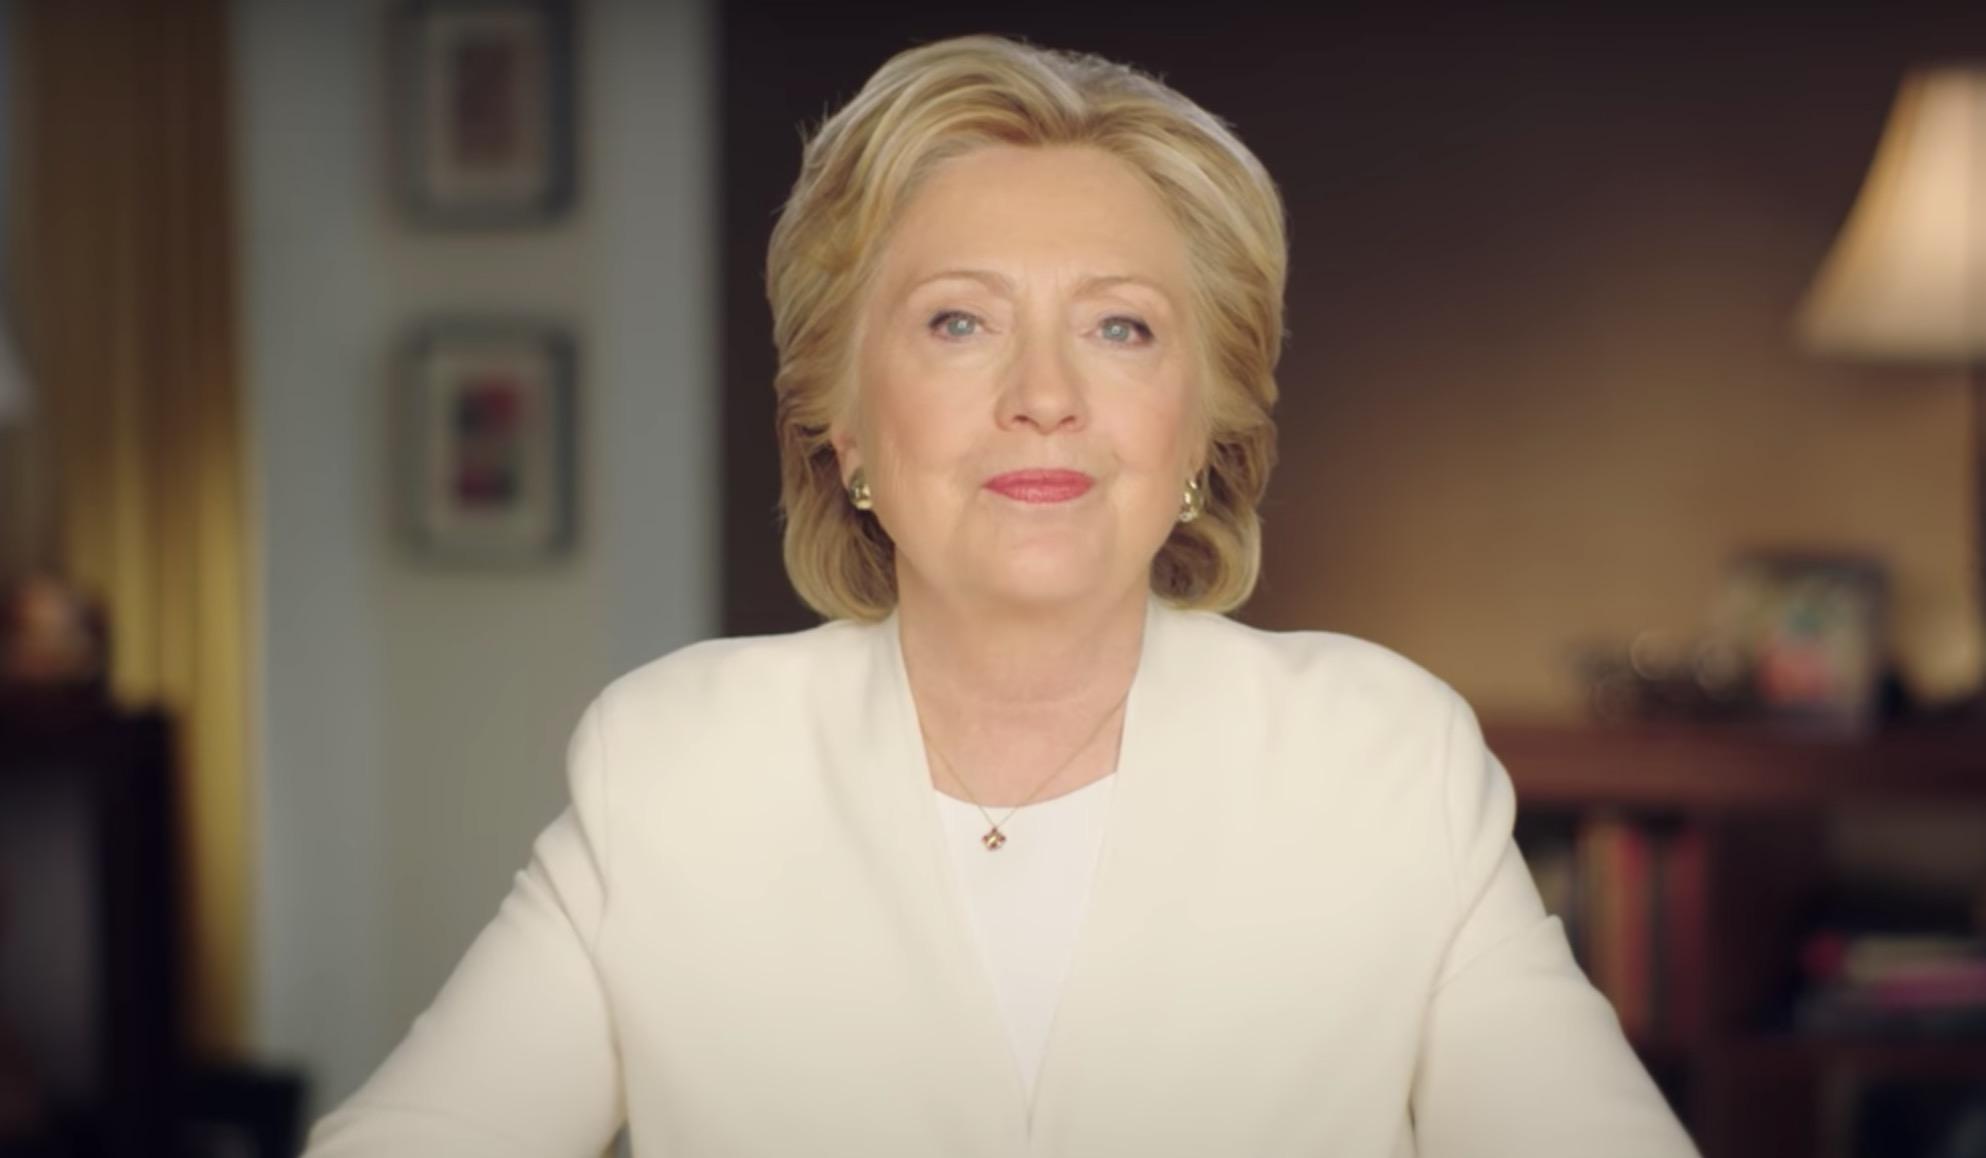 Clinton hopes her star power will help Gillum, Shalala